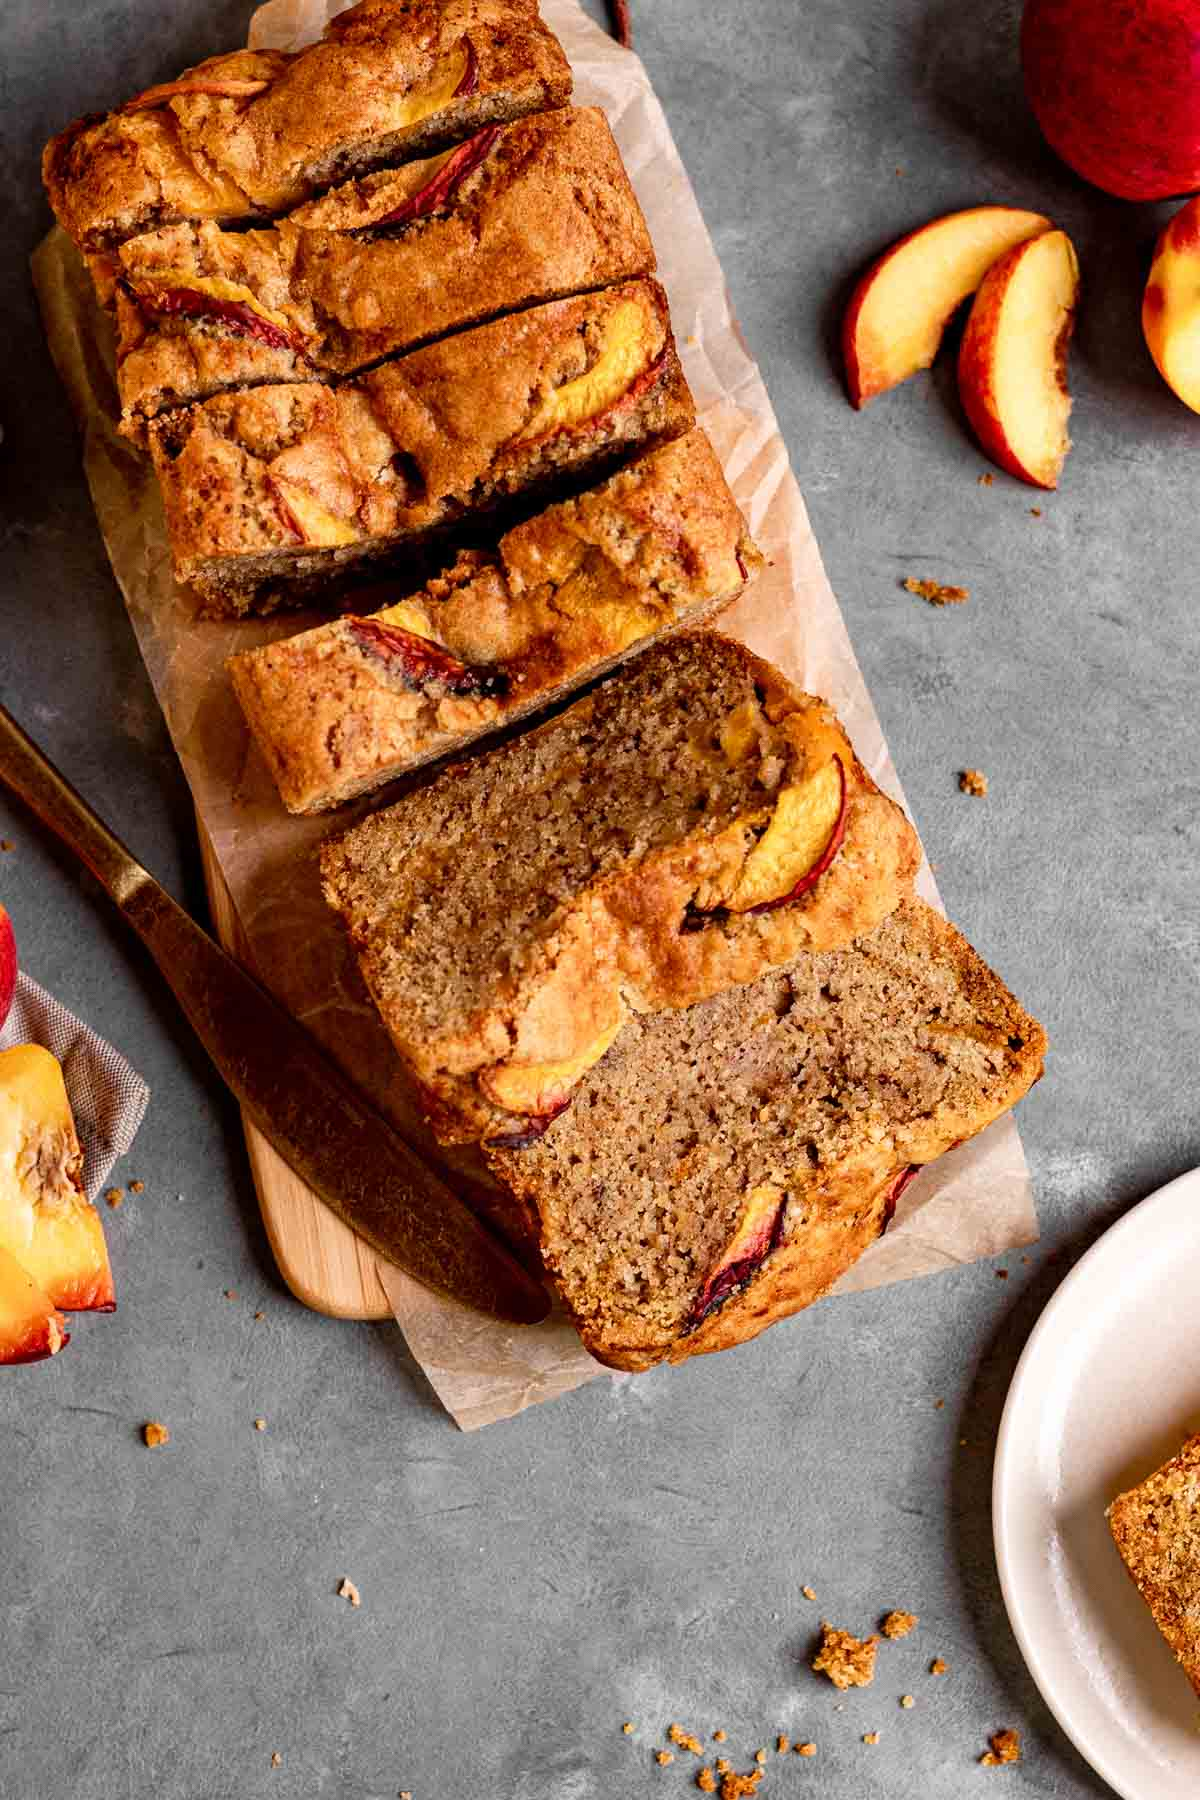 12. Cinnamon Peach Bread